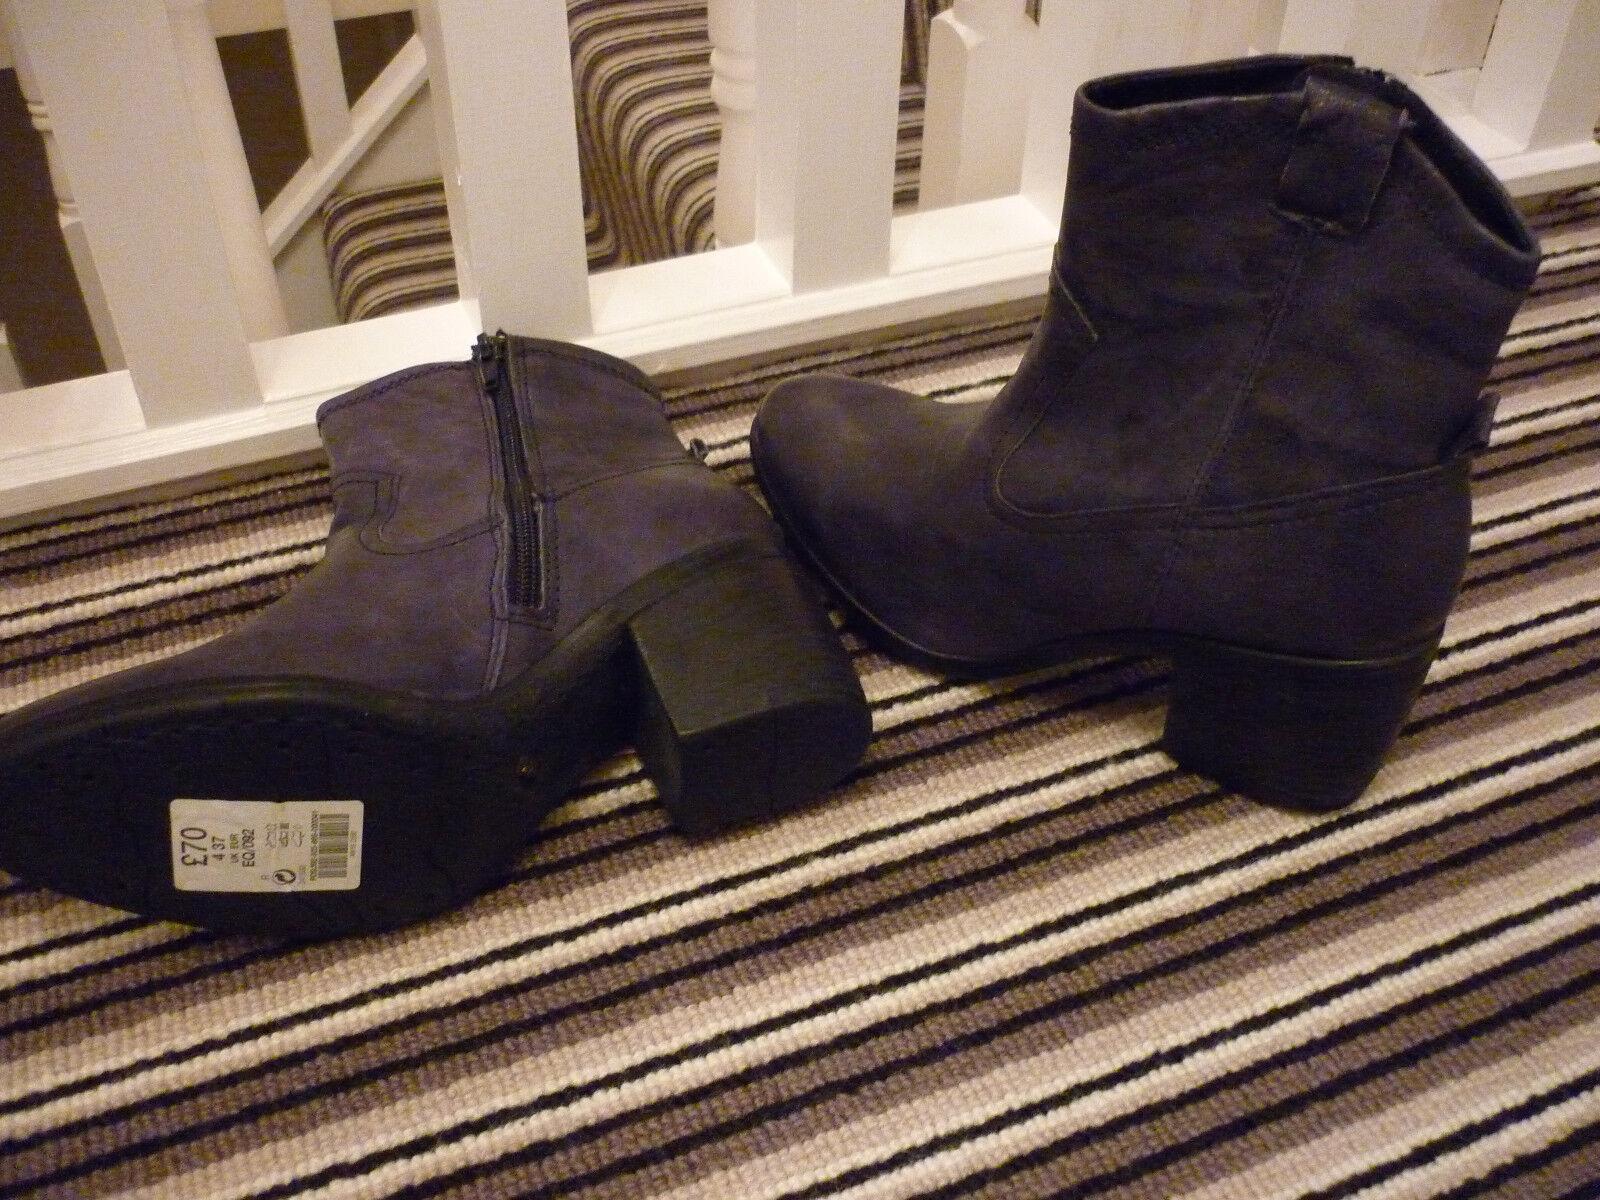 Next - 37 Boots - Size 4 / 37 - - BRAND NEW b6a091